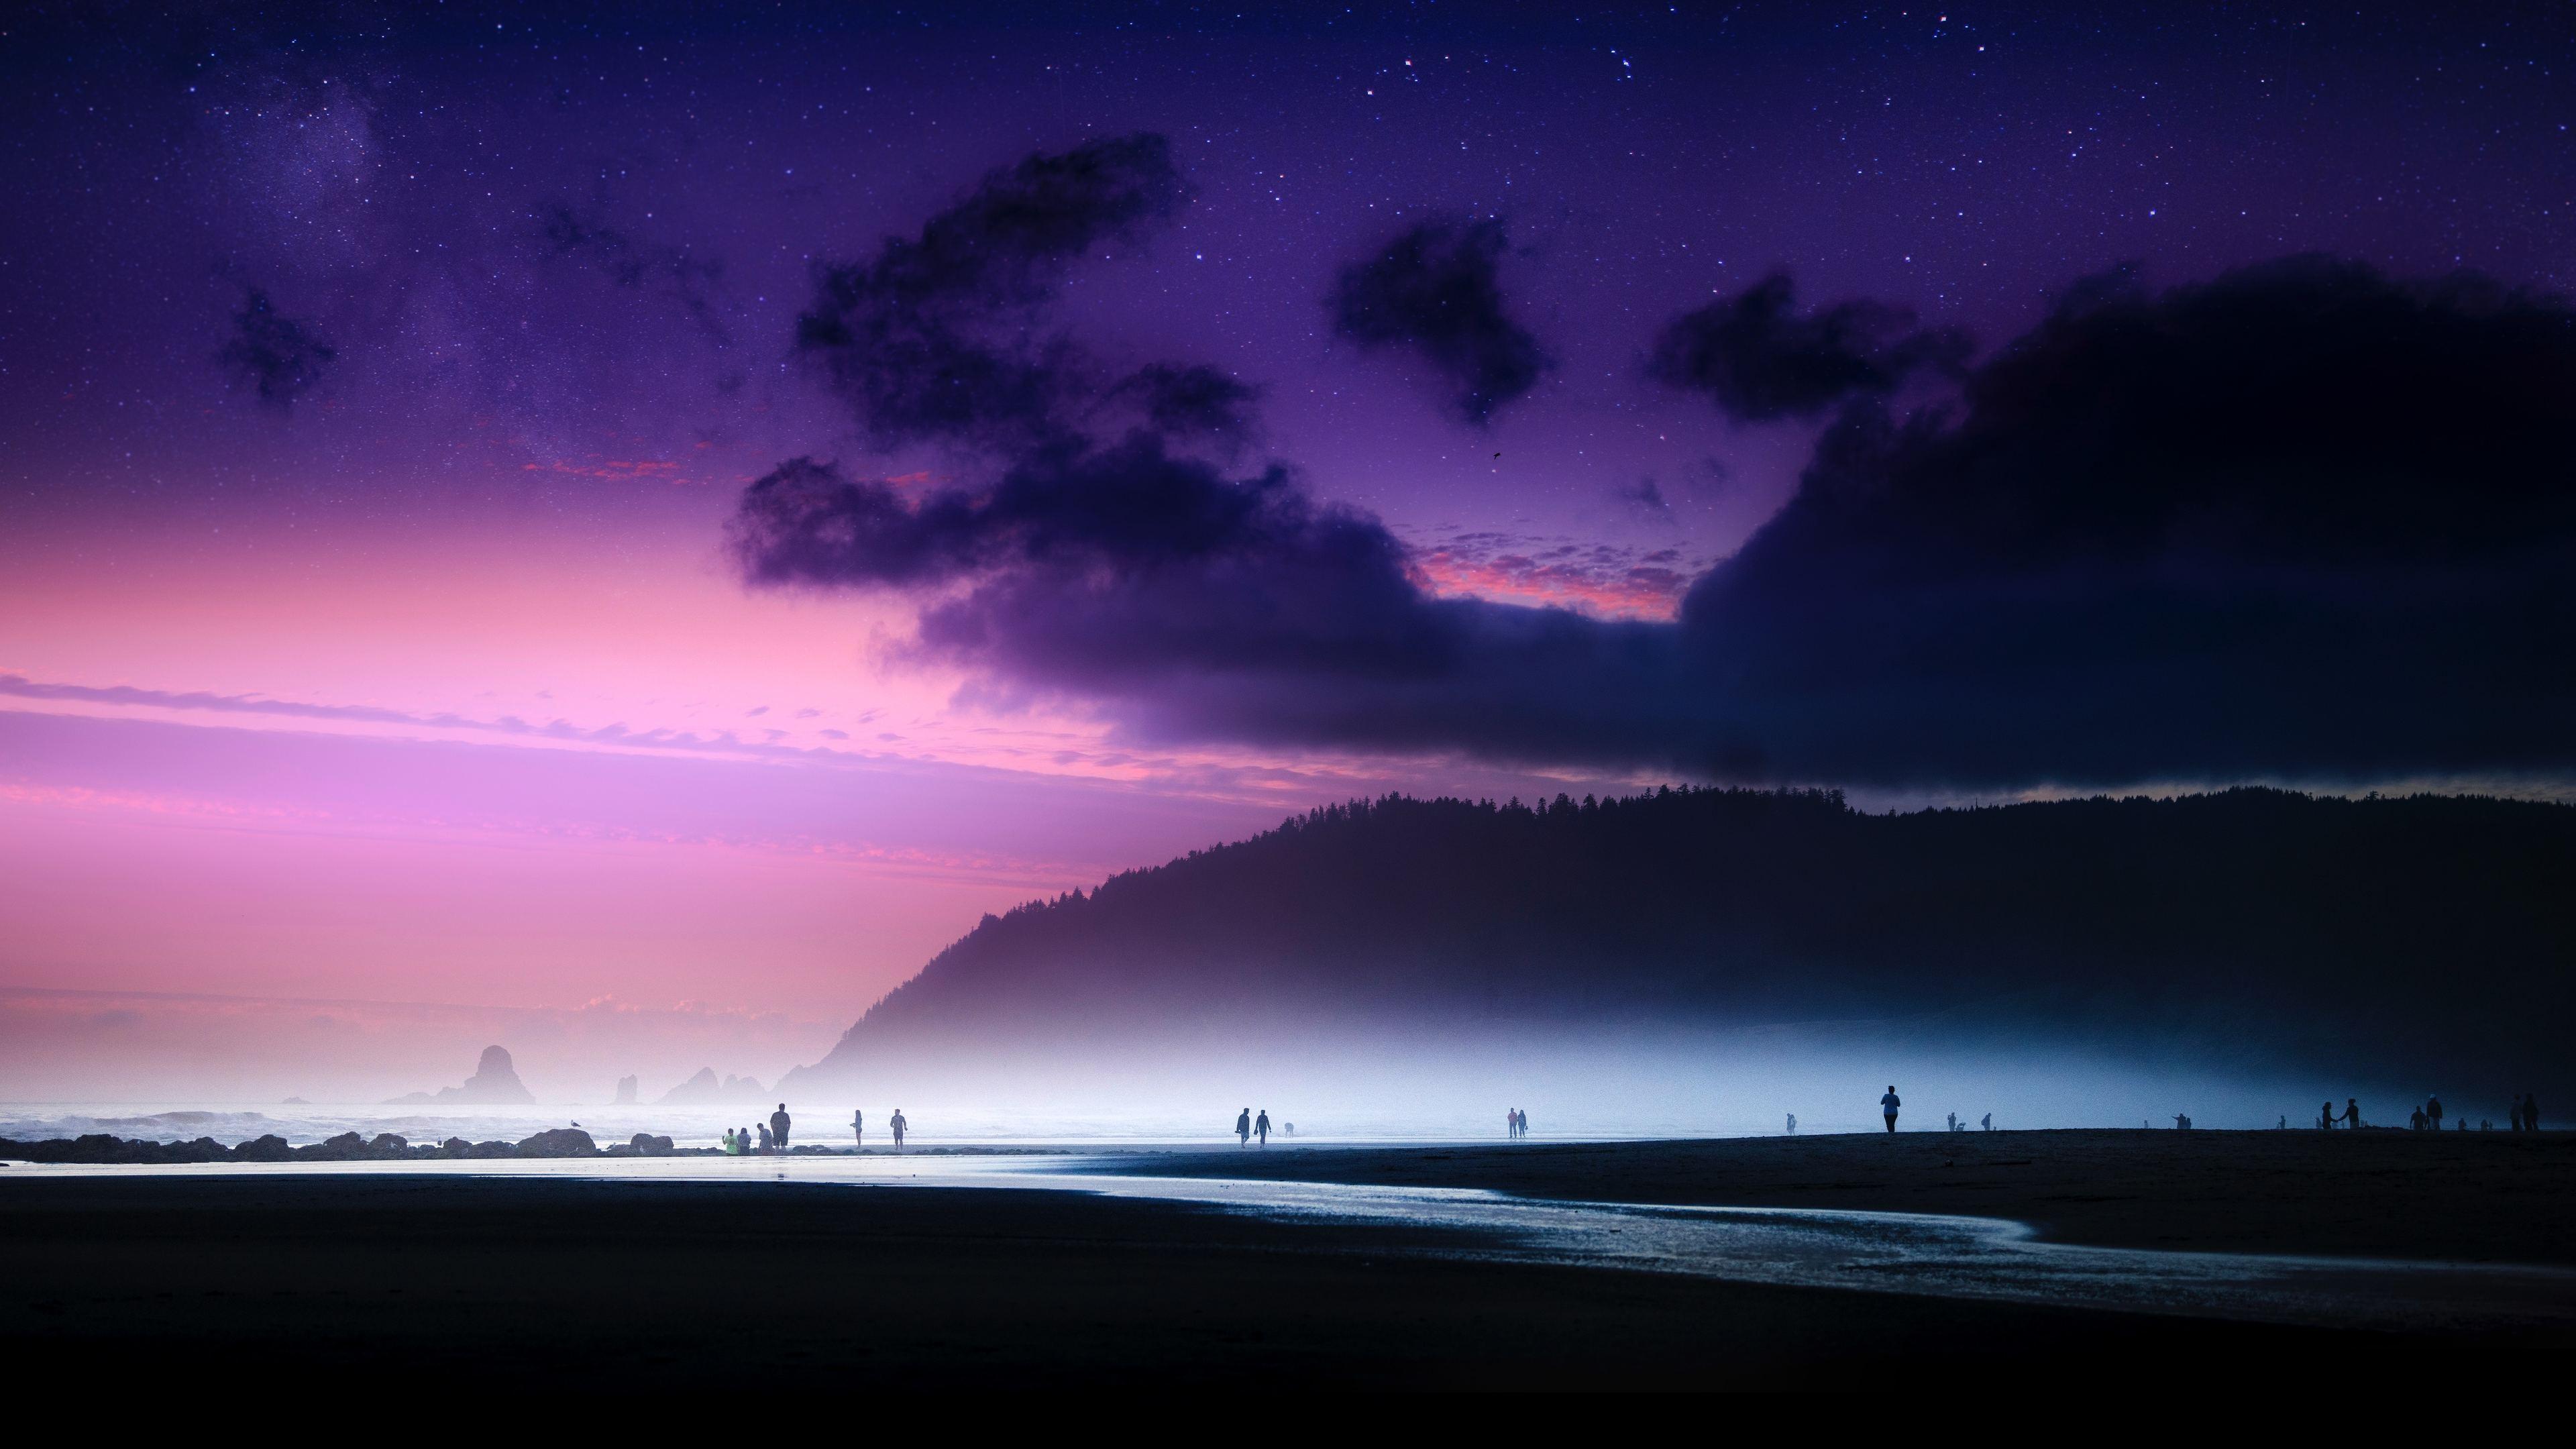 dreamy beach sky island ocean evening 1540142944 - Dreamy Beach Sky Island Ocean Evening - sky wallpapers, ocean wallpapers, nature wallpapers, island wallpapers, hd-wallpapers, evening wallpapers, dreamy wallpapers, beach wallpapers, 4k-wallpapers